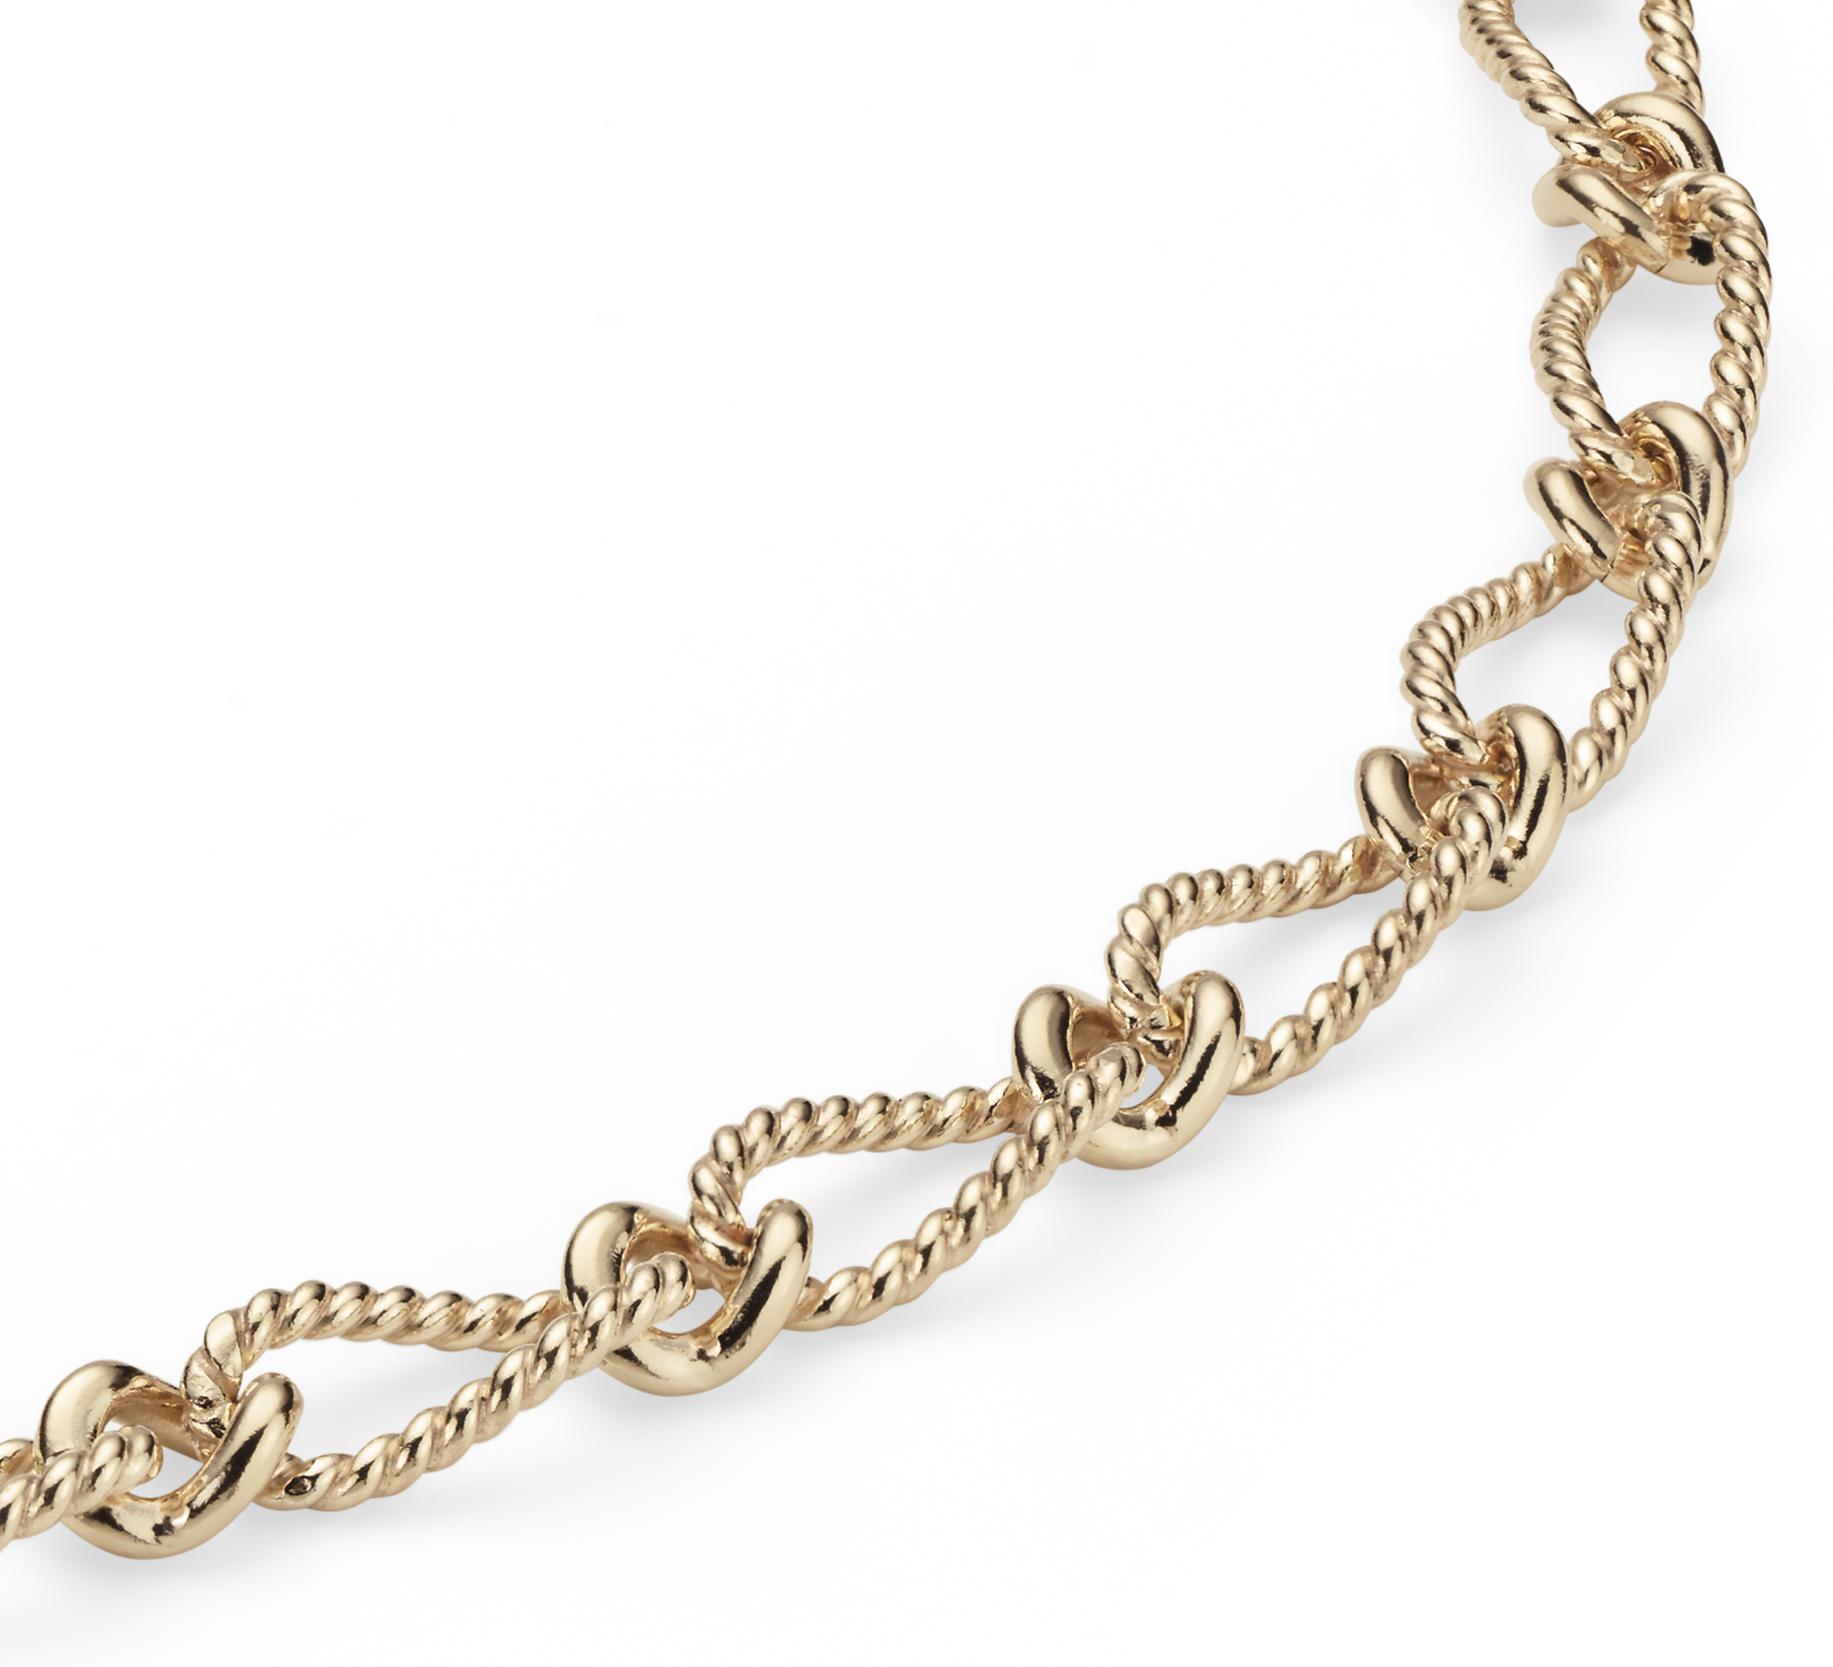 Collar elegante en oro amarillo de 14k